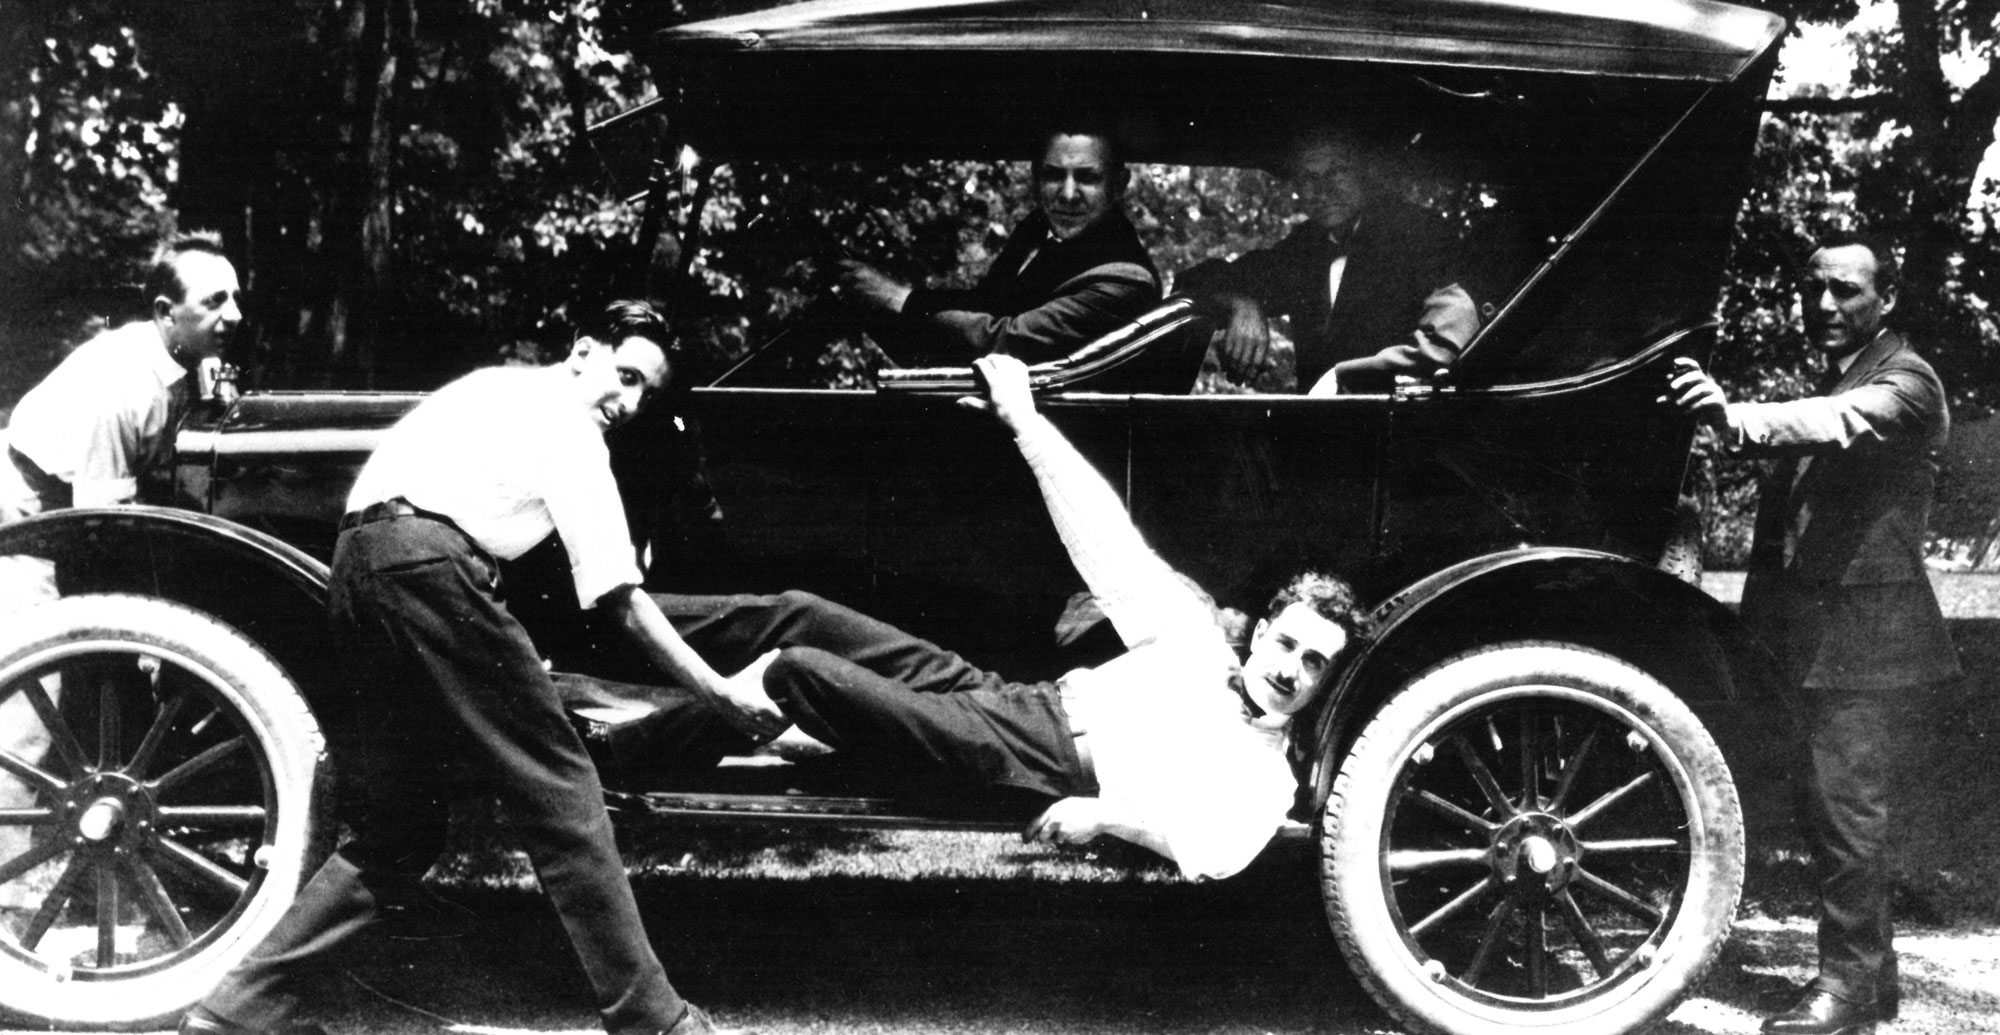 Servants fooling around on a car